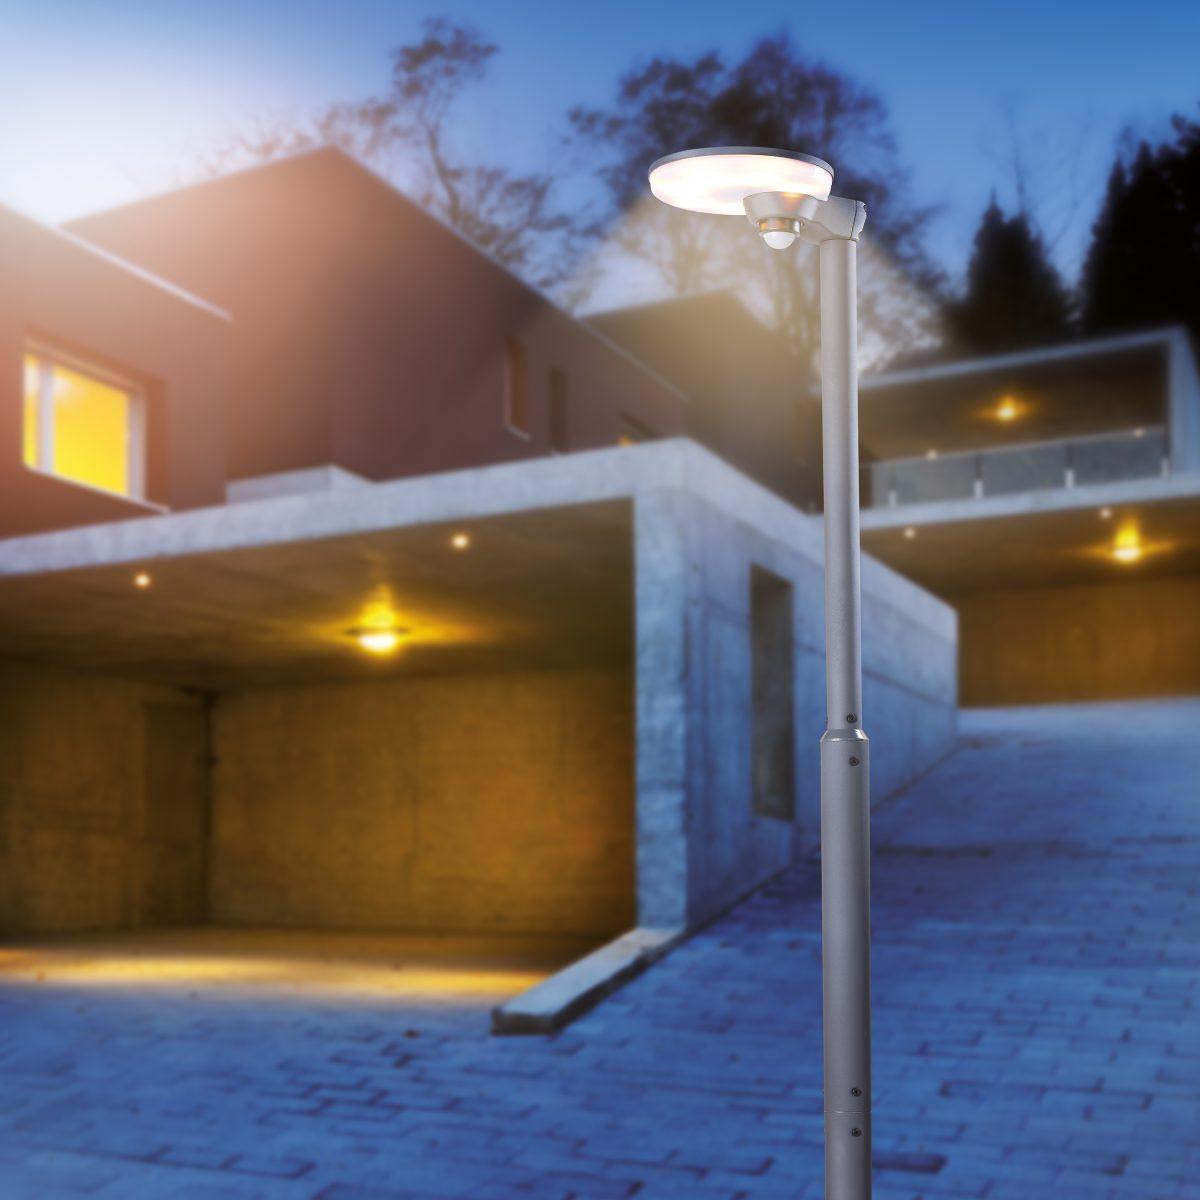 Solarlaterne im Winter